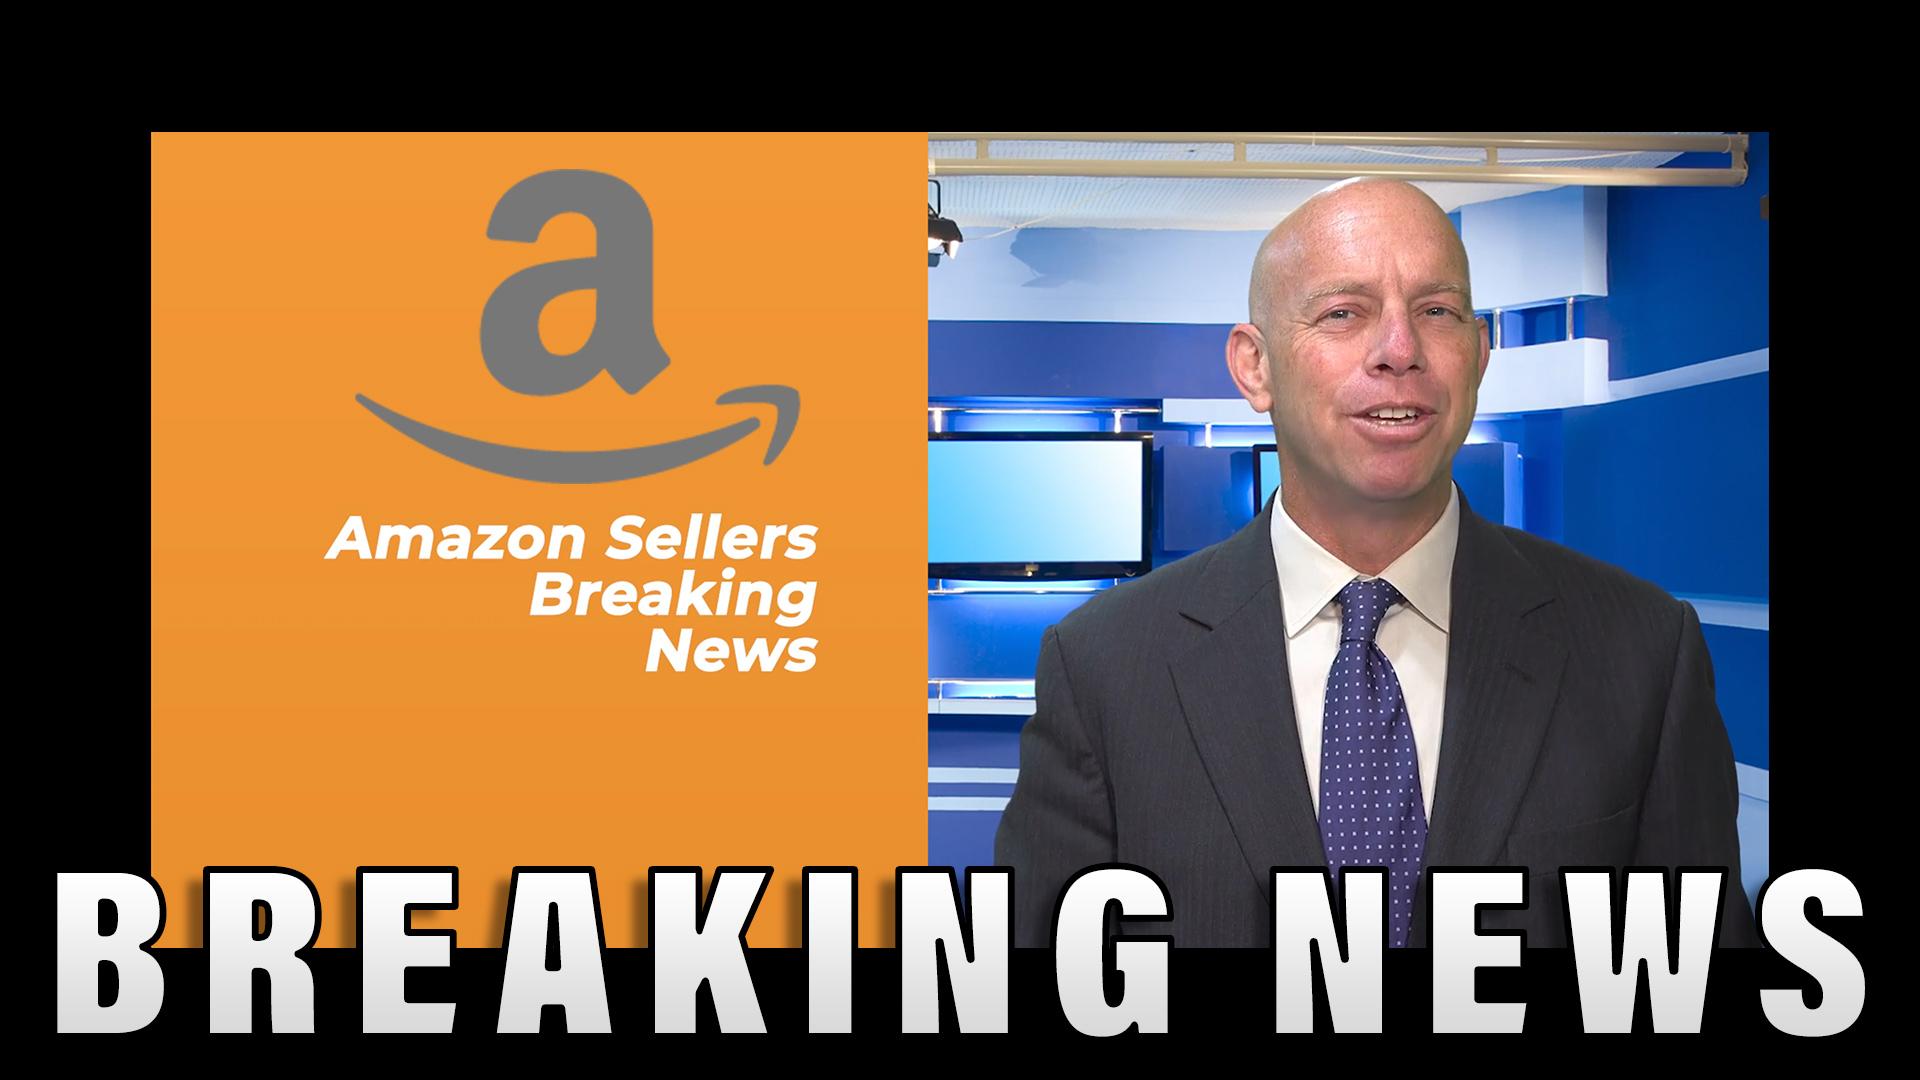 Amz Sellers' News 9-18-19